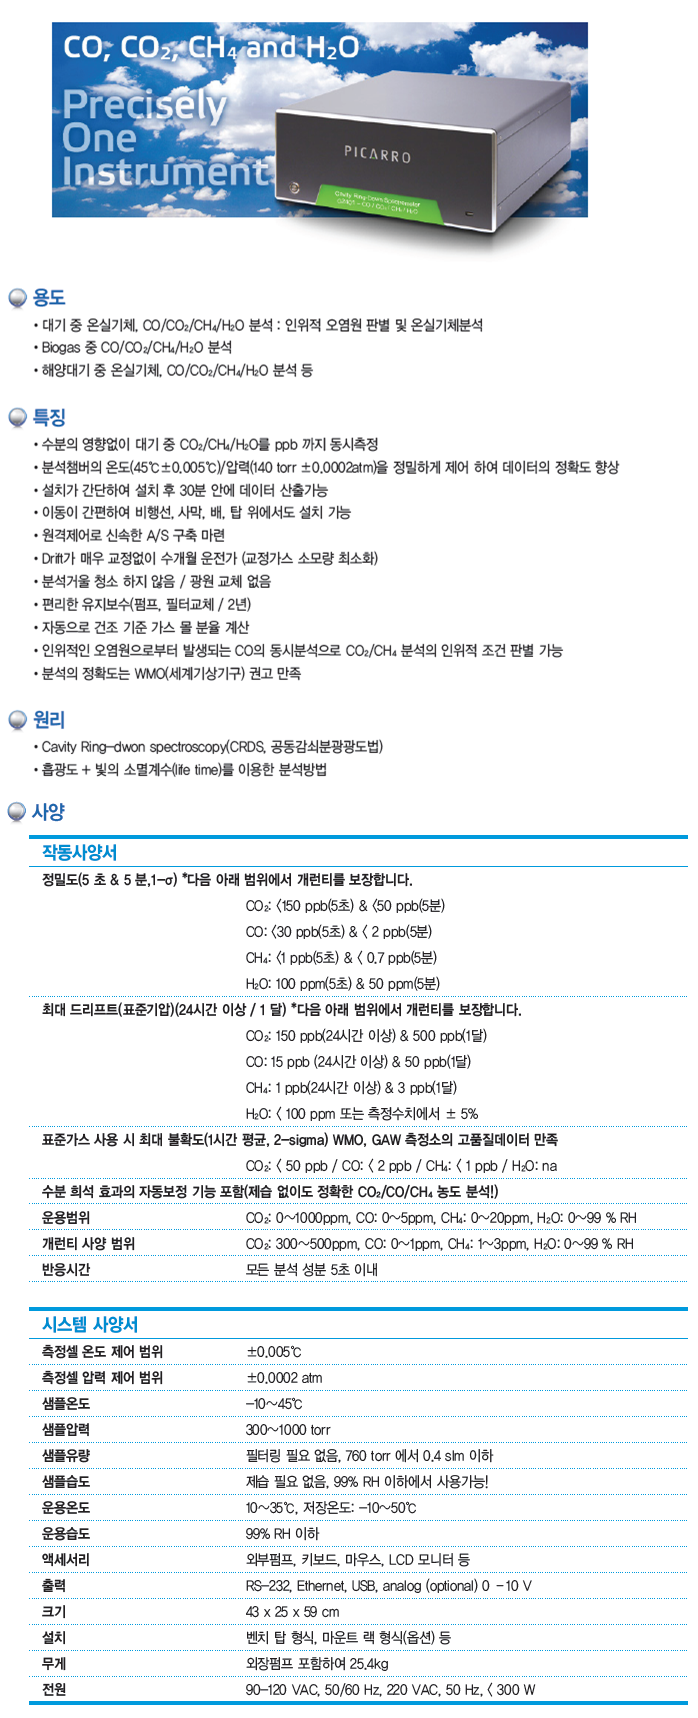 KNJ CO / CO2 / CH4 / H2O 분석기 G2401, G2301